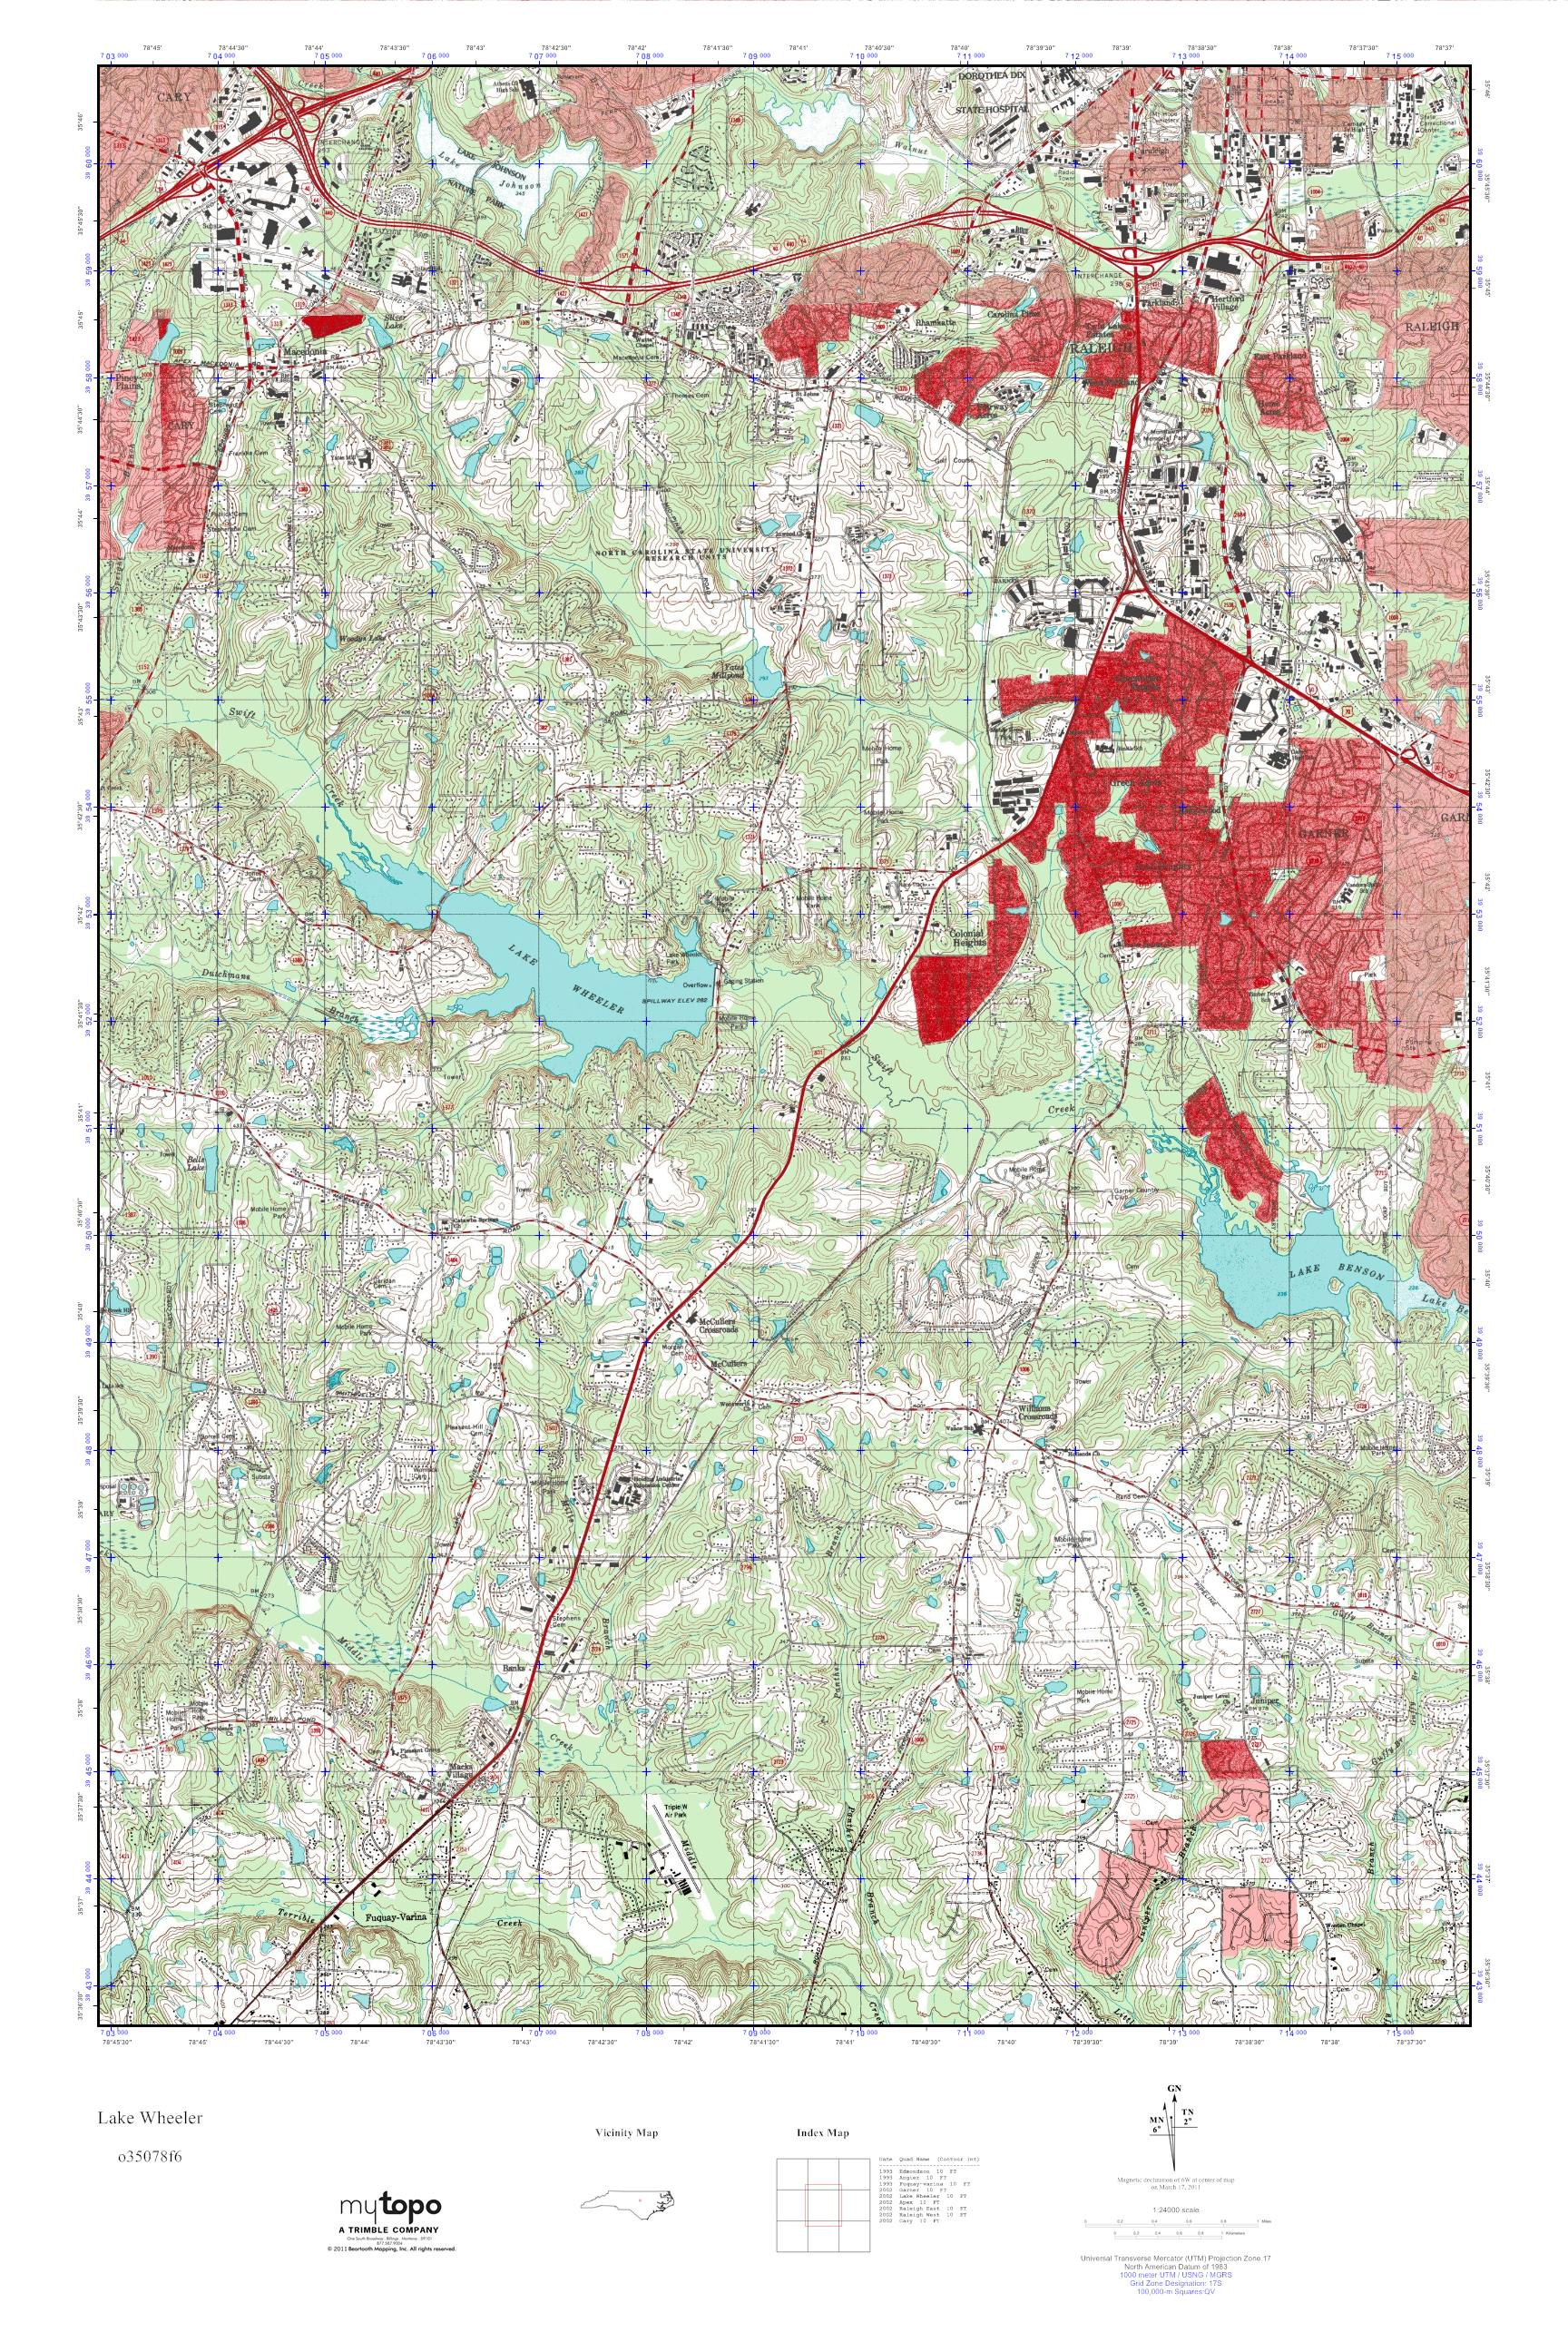 Mytopo Lake Wheeler North Carolina Usgs Quad Topo Map